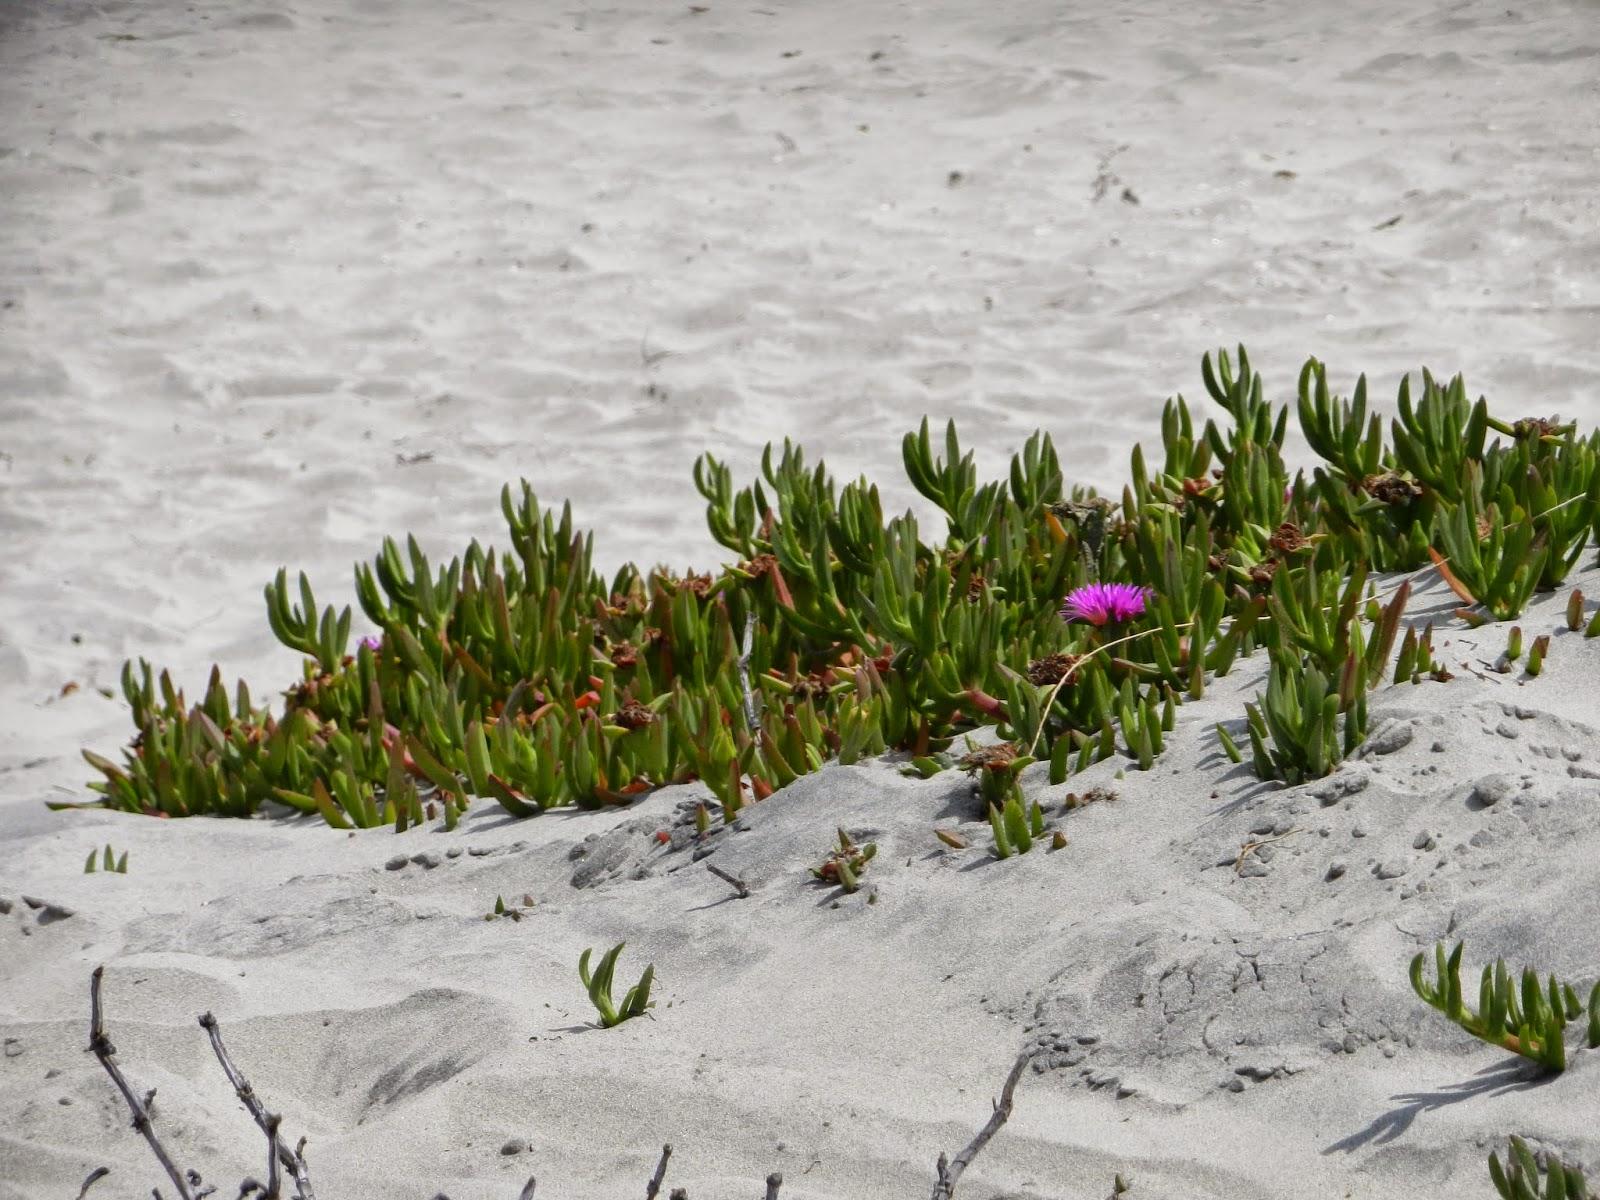 san diego coronado beach